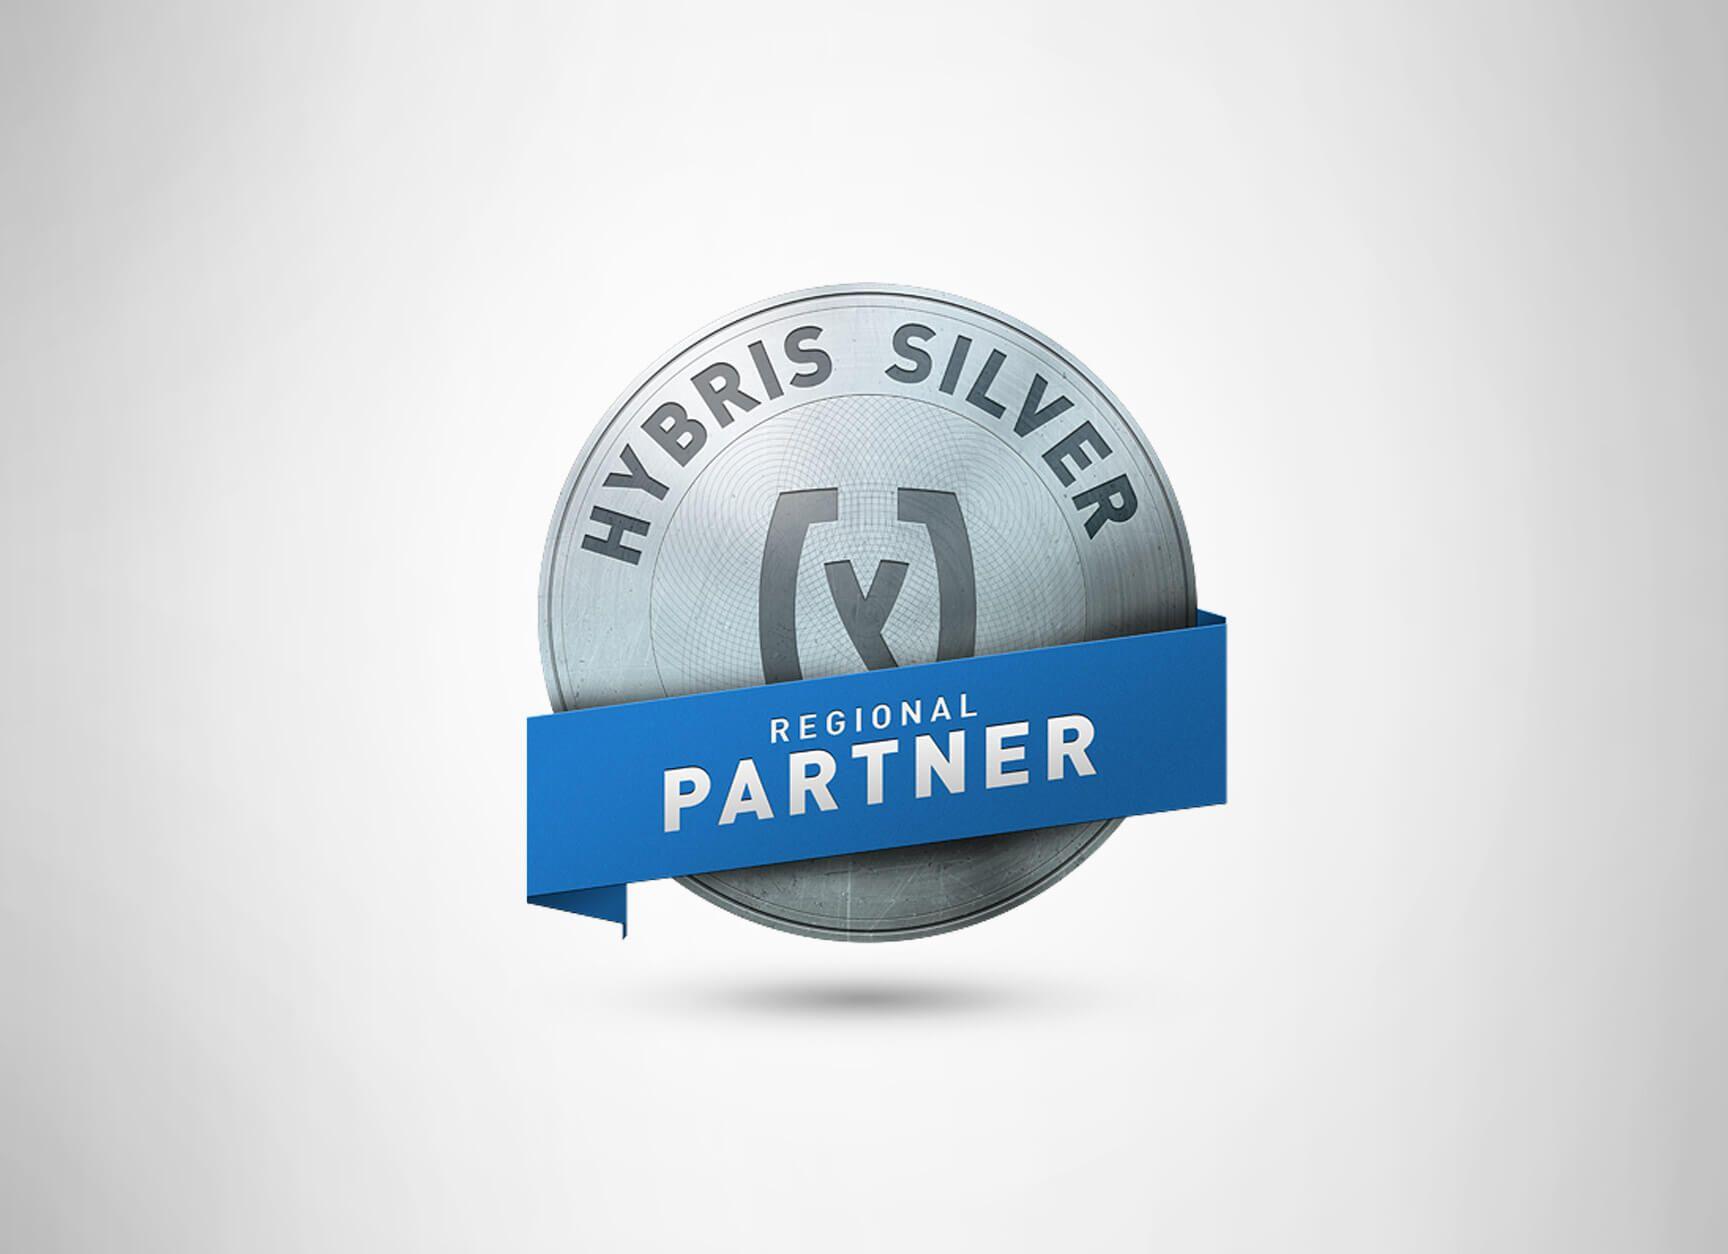 diva-e ist hybris Software Partner